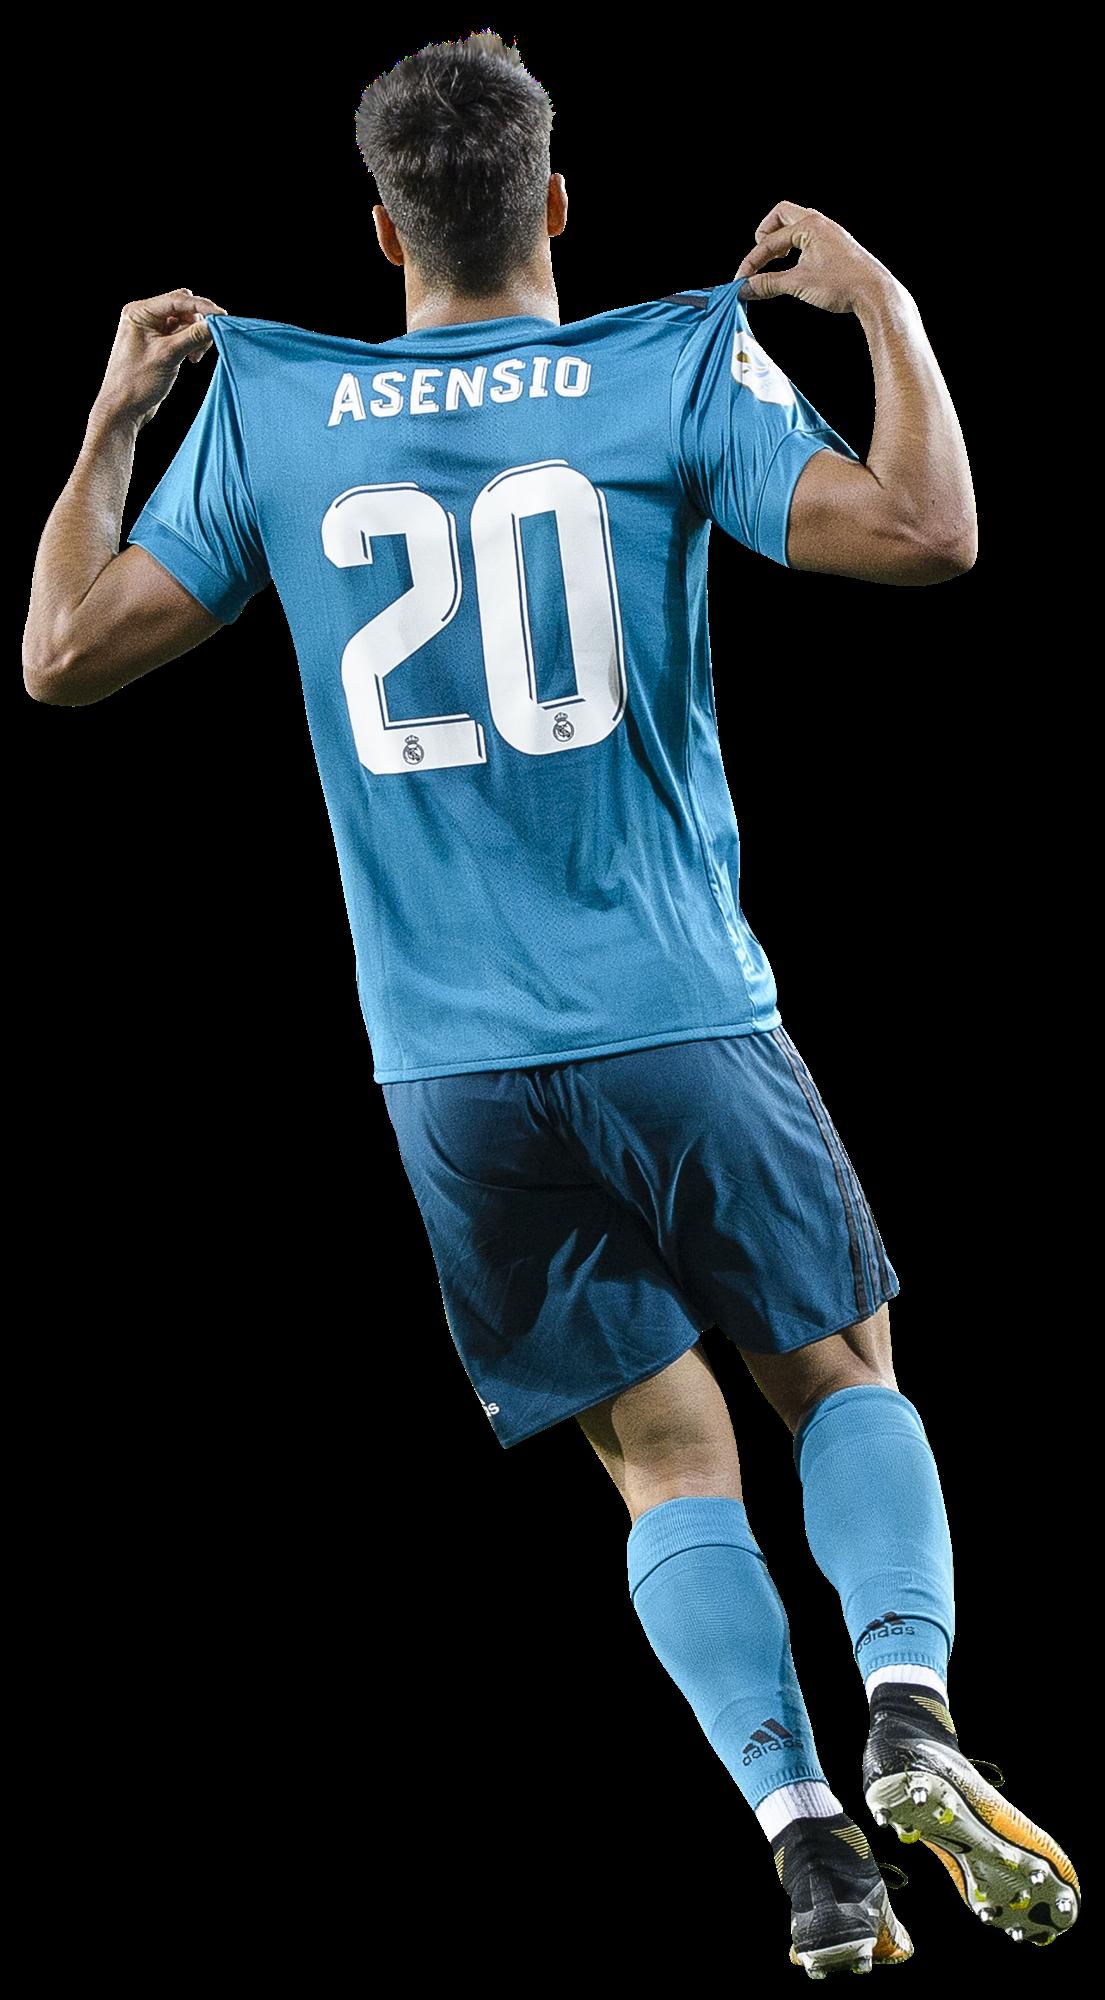 marco asensio football render - 40265